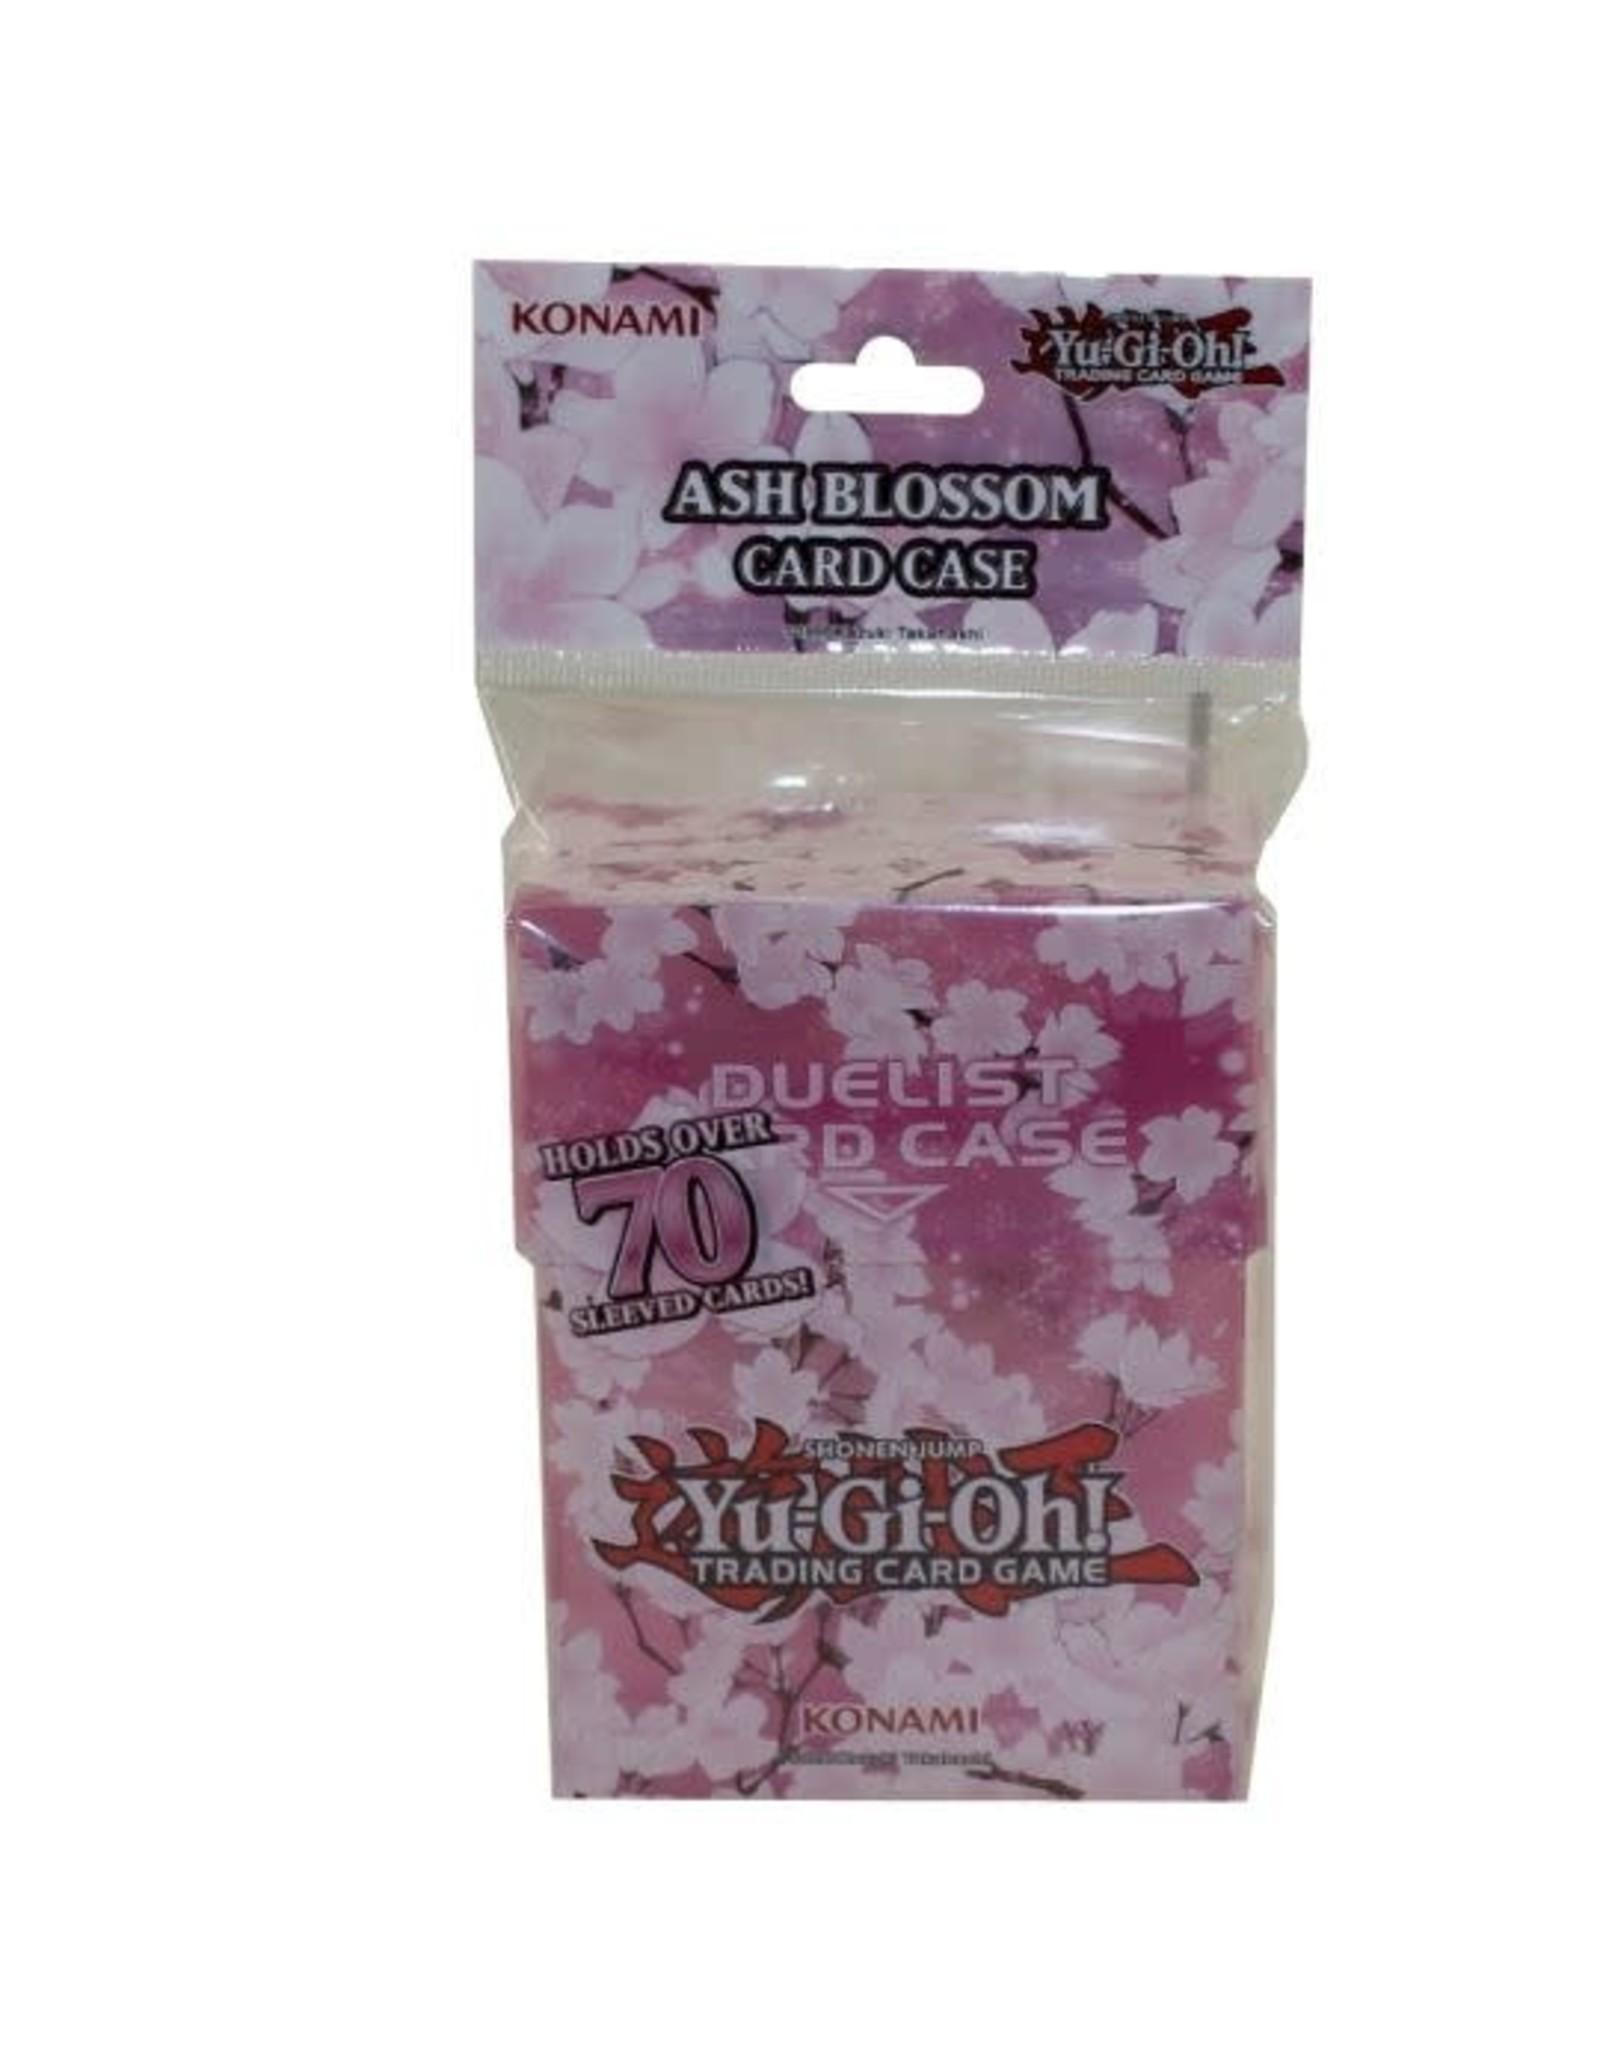 Konami Ash Blossom Card Case